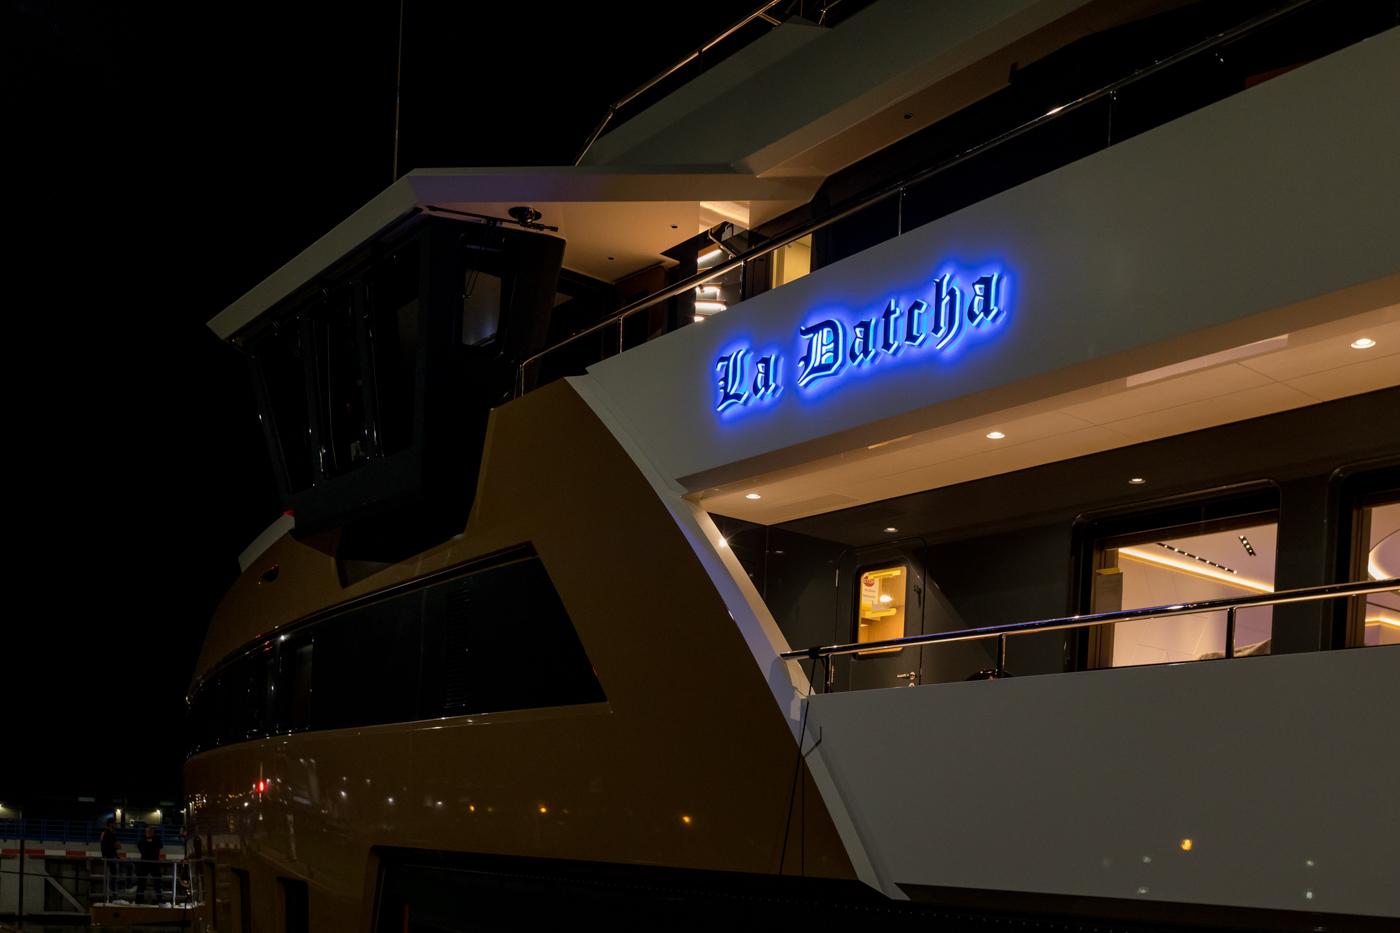 Yacht-La-Datcha-77-Heliski-Russia-11